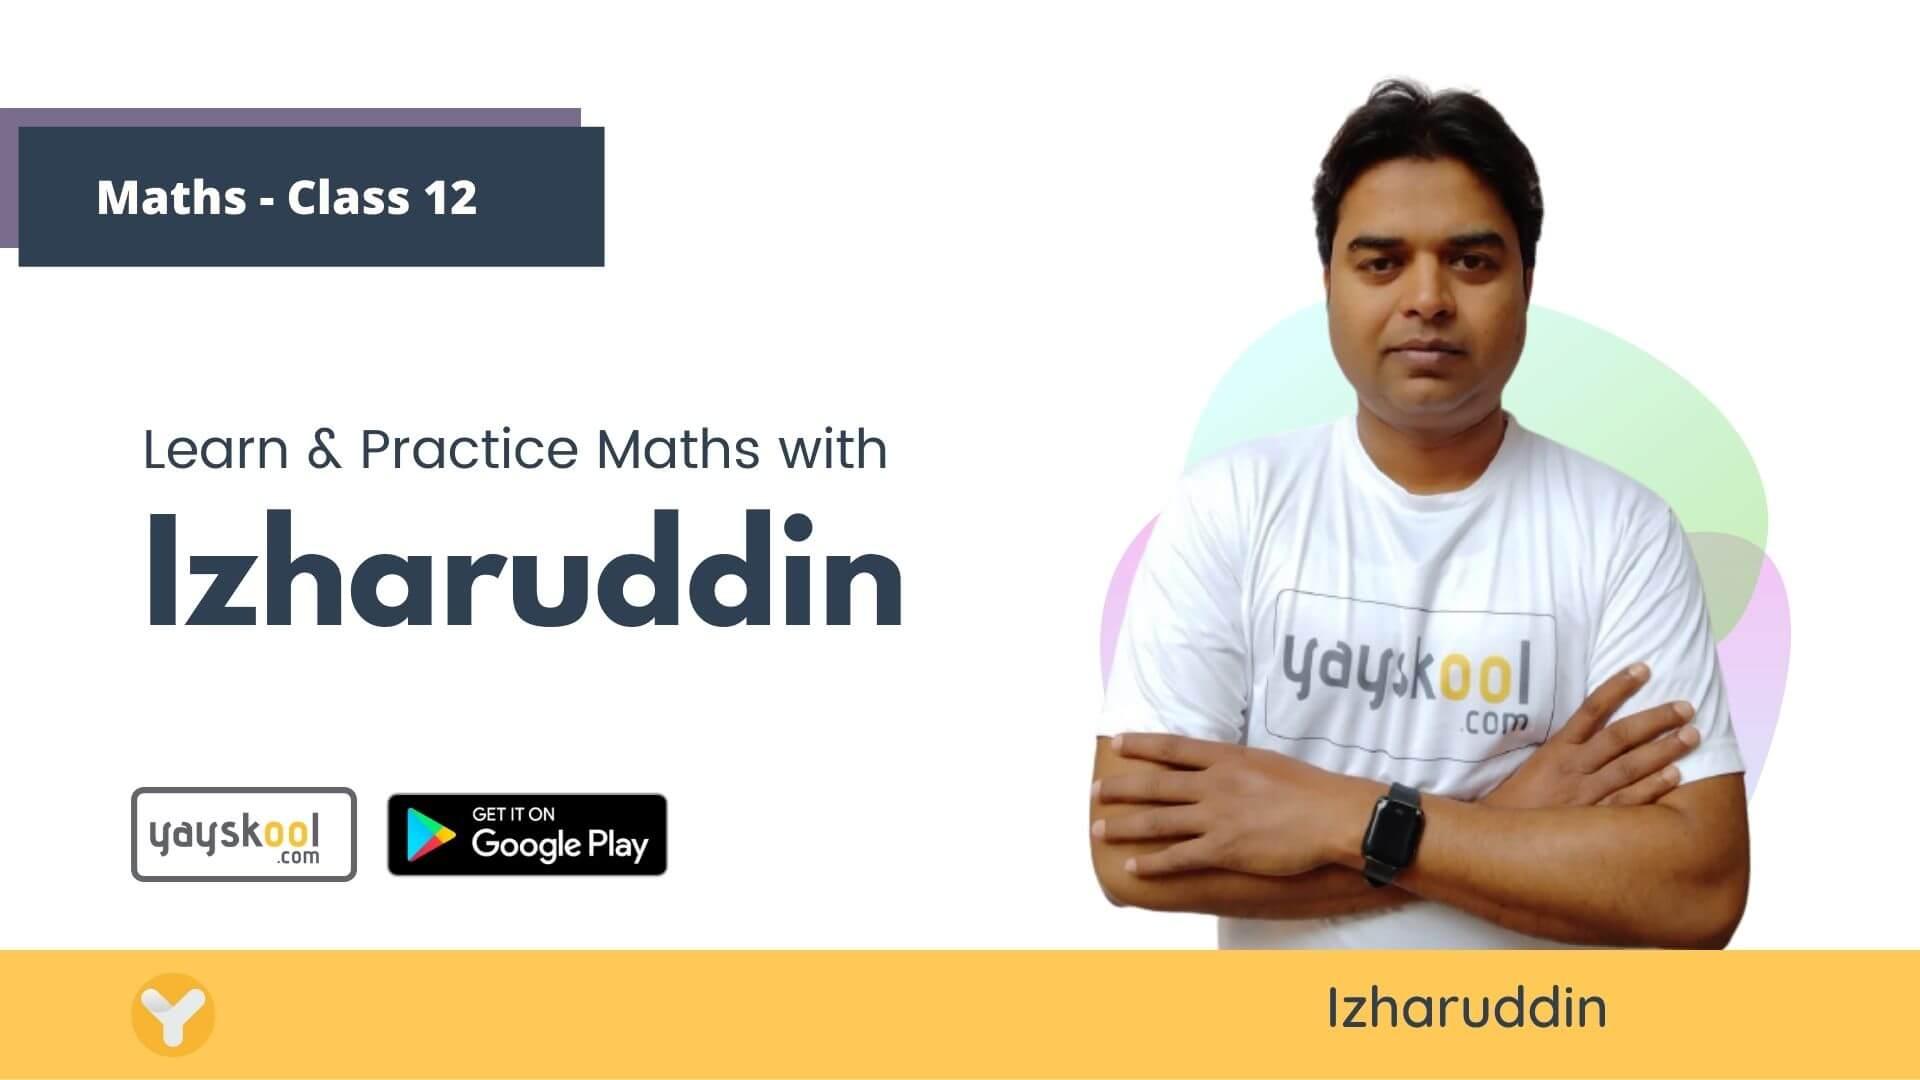 Maths Course for Class 12 (NCERT) - Study Maths With Izharuddin